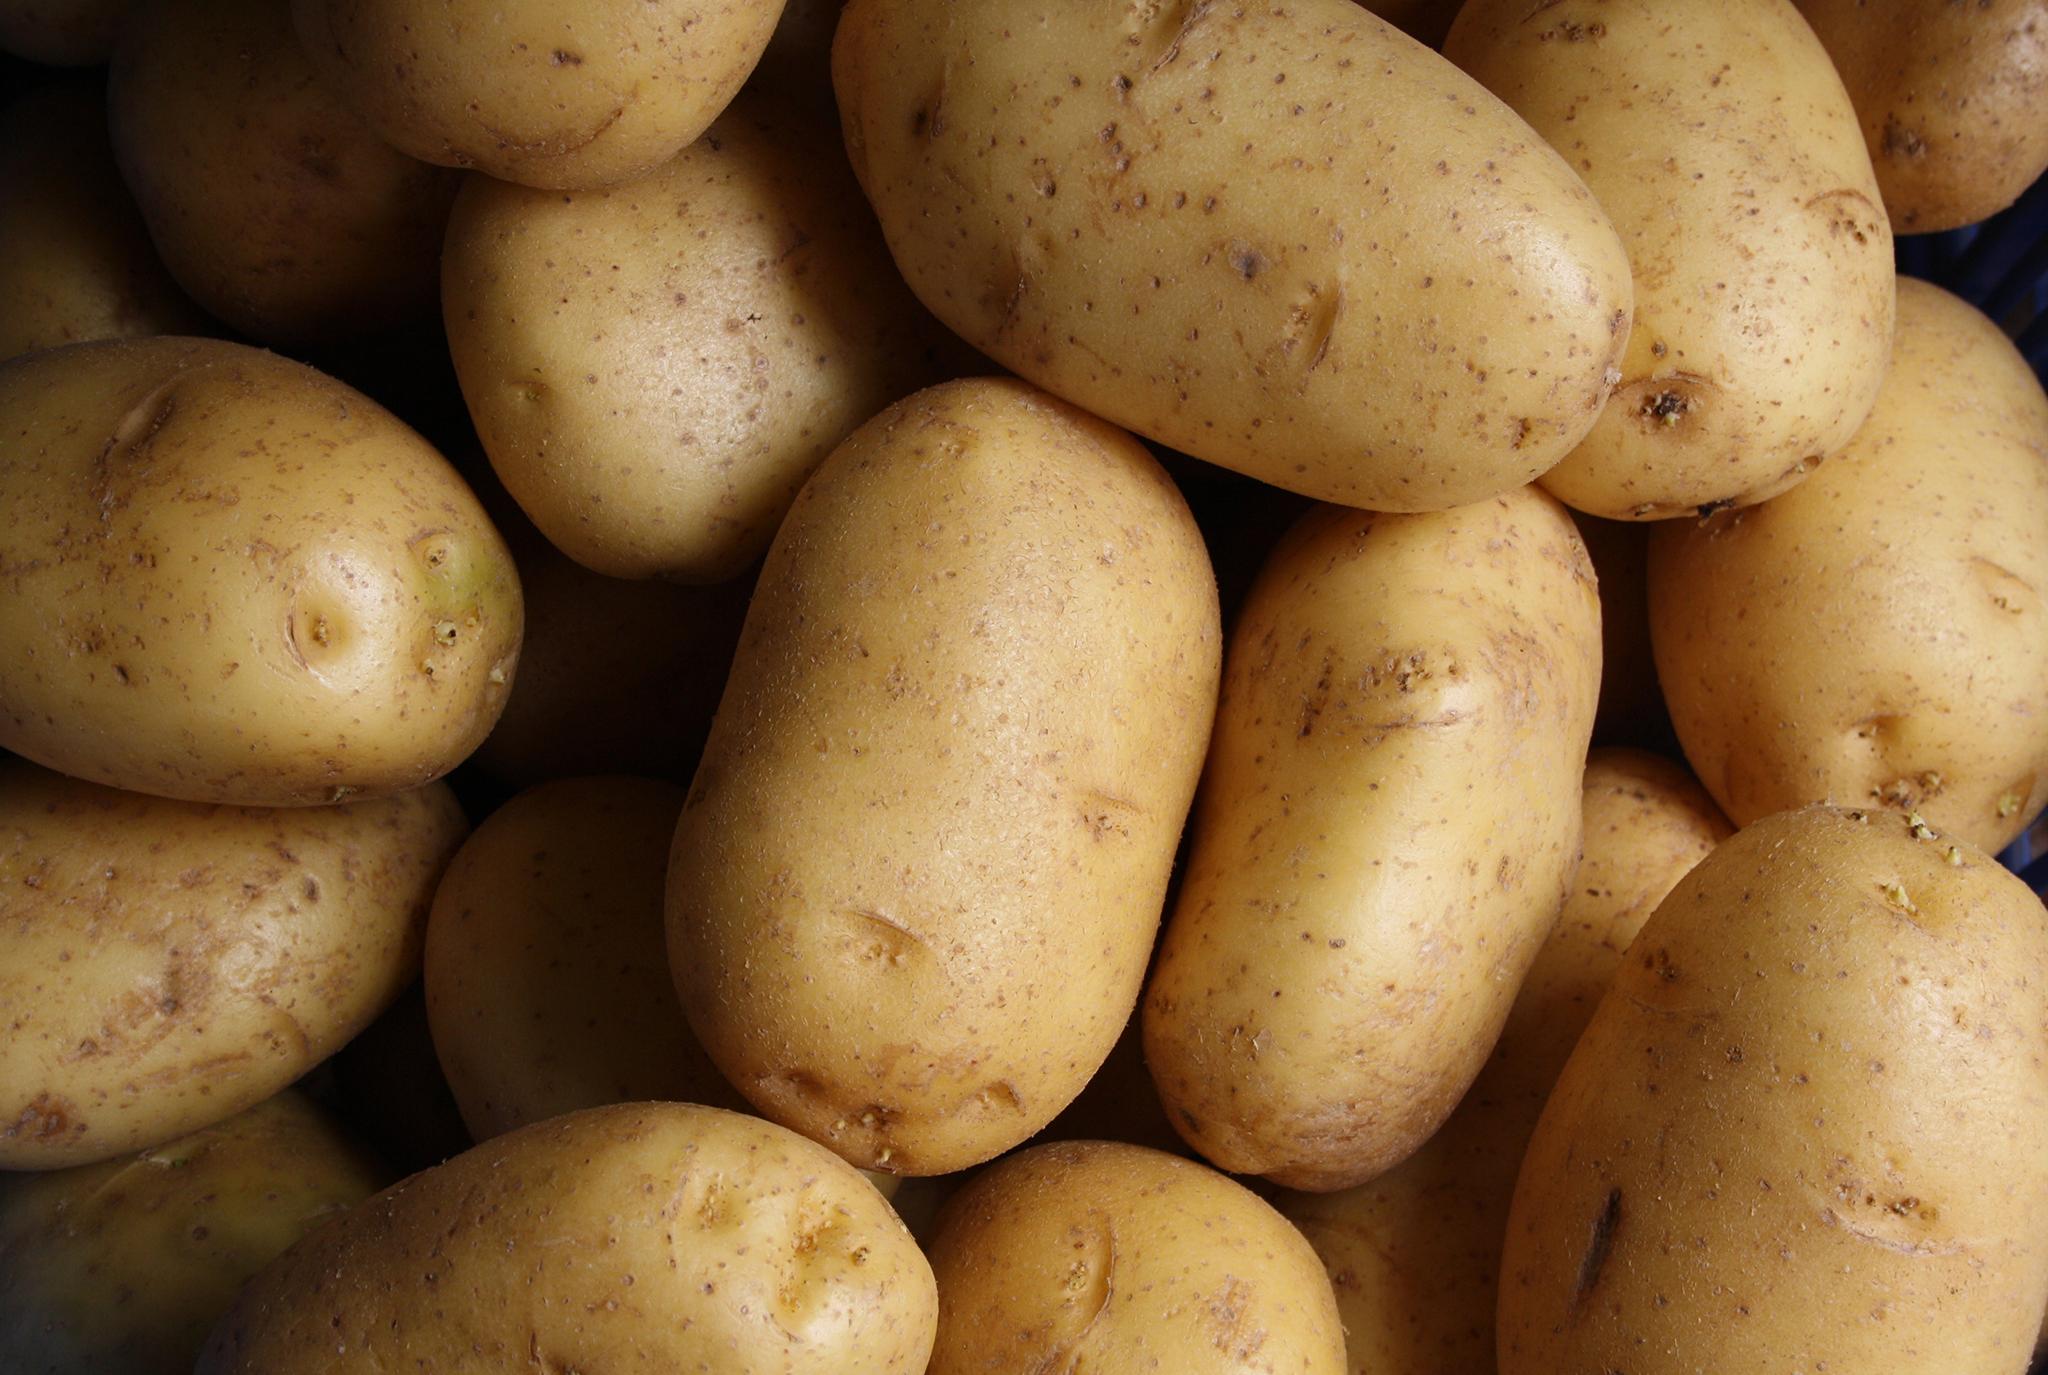 Potatoes_BLOG.jpg